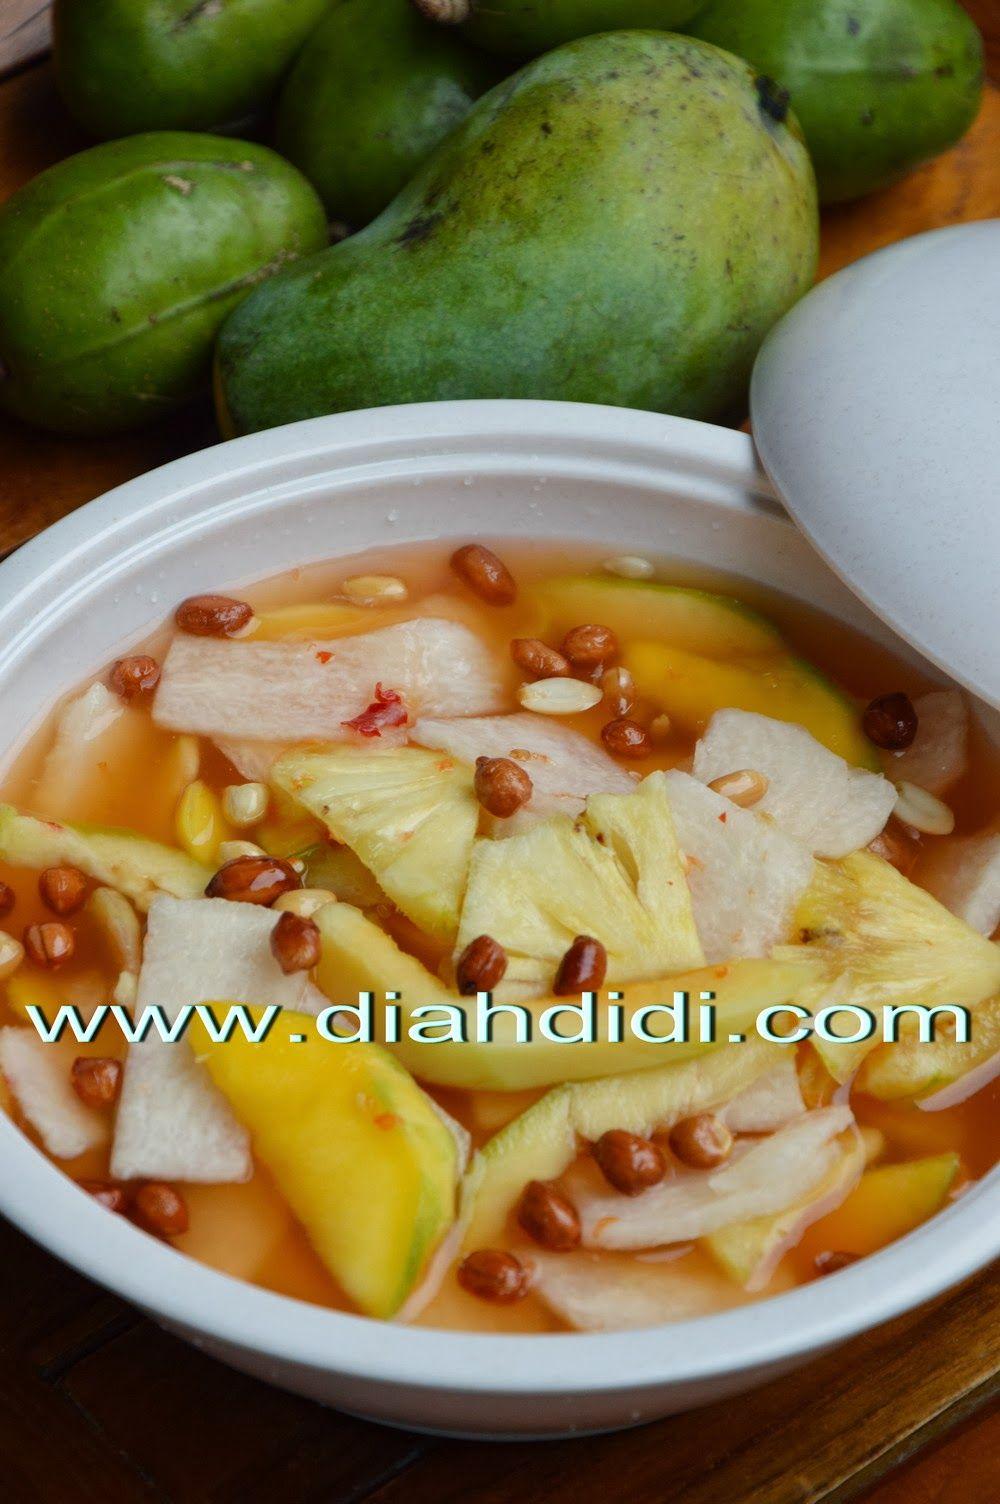 Resep Asinan Bogor : resep, asinan, bogor, Salads/Fruits